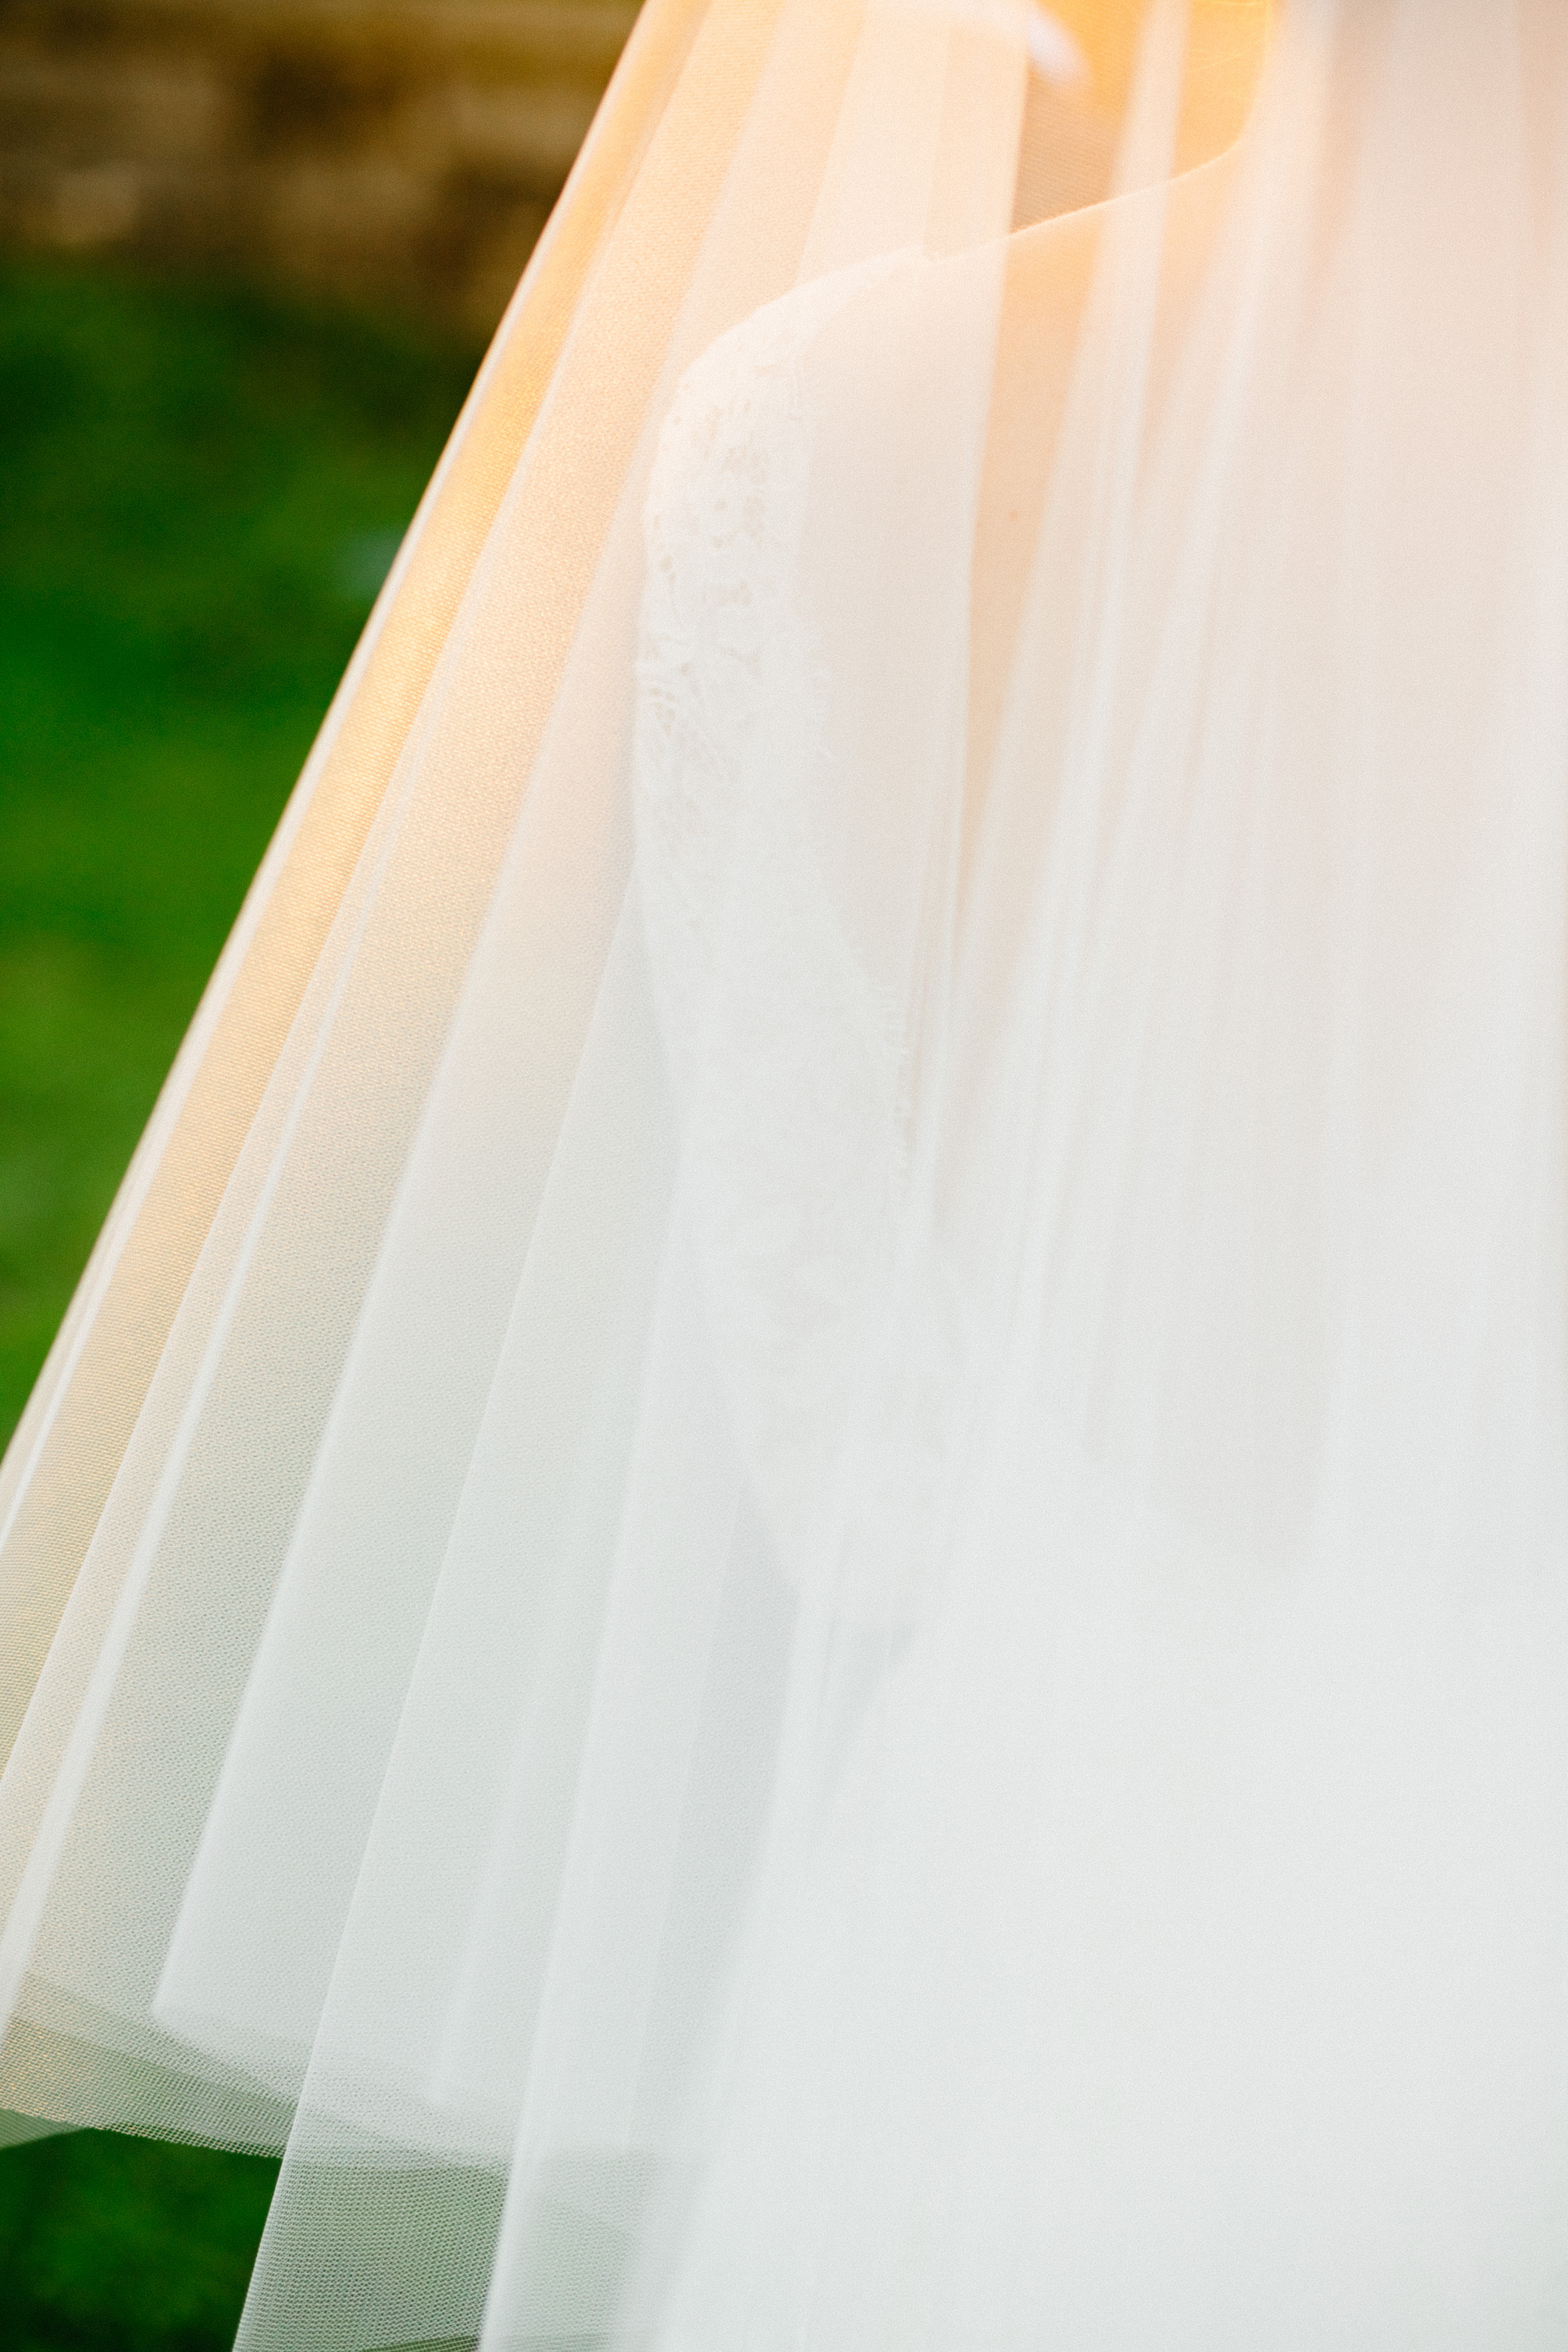 new england film photographers timeless and soft moments vogue.com details of celebrity new england weddings